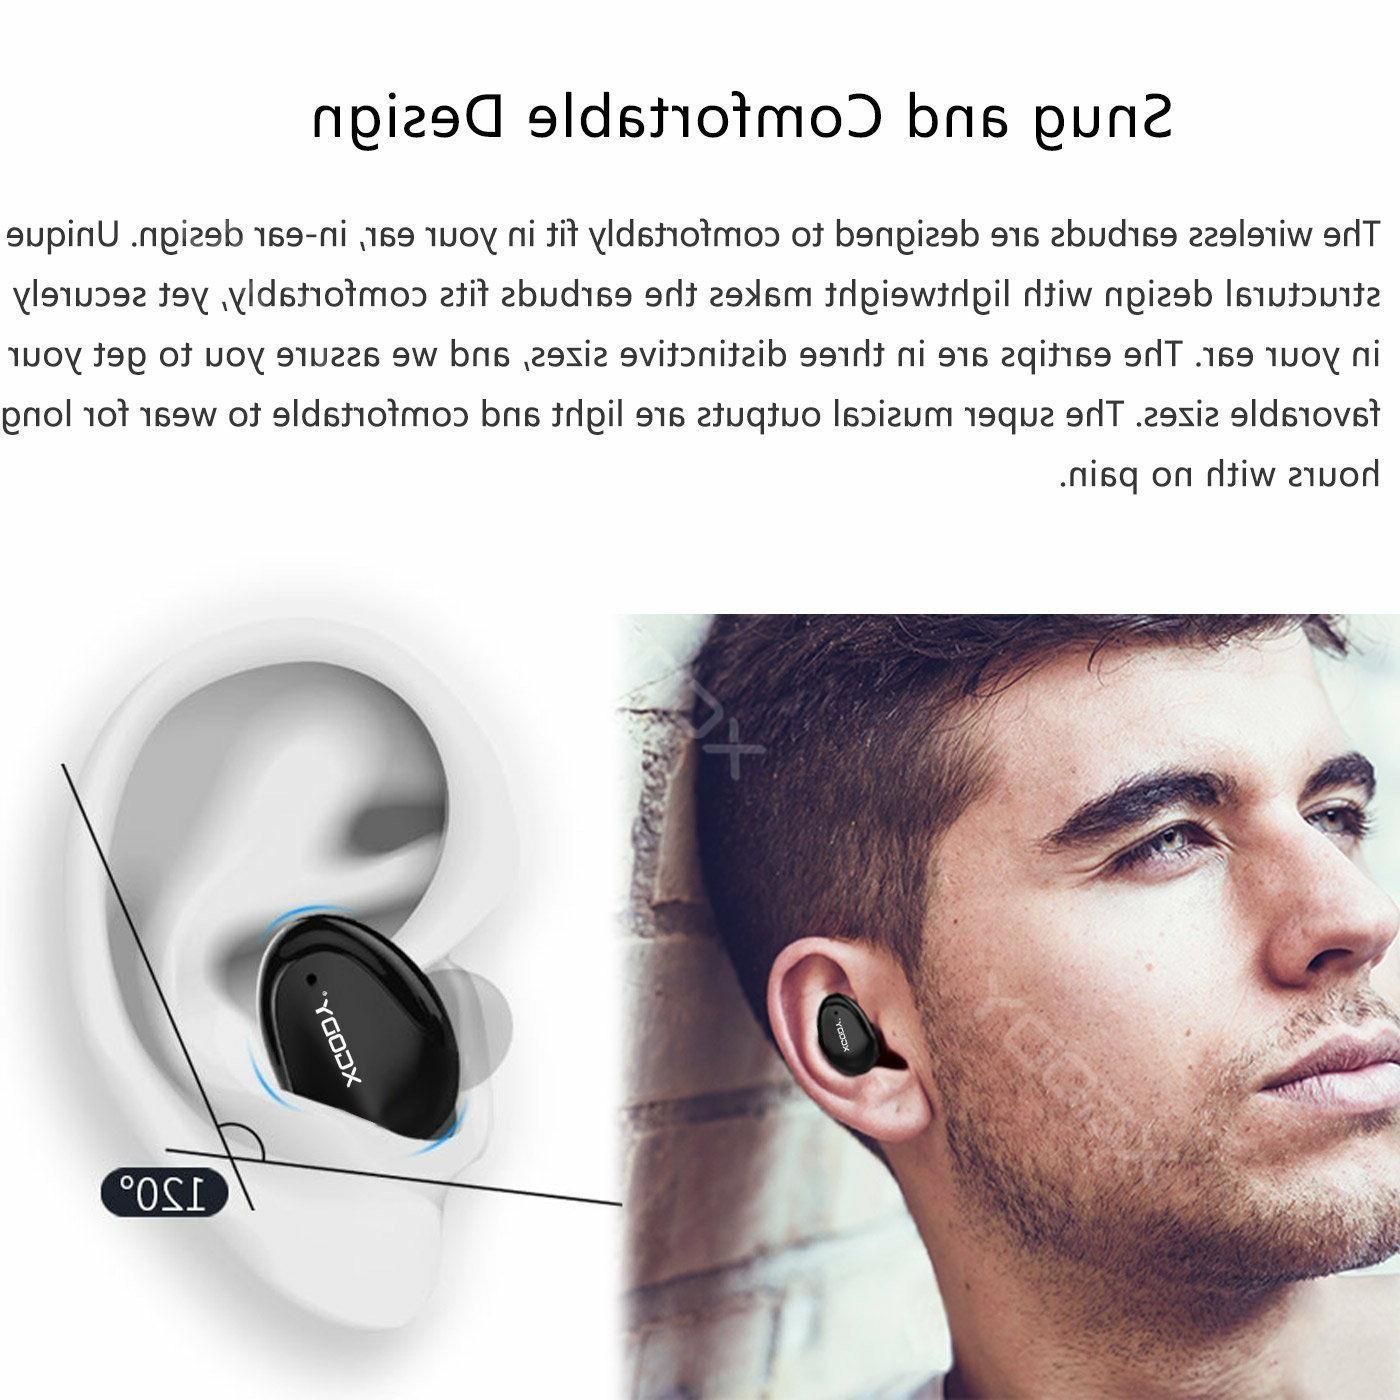 XGODY Mini Wireless Earbuds Stereo Headset Cancelling